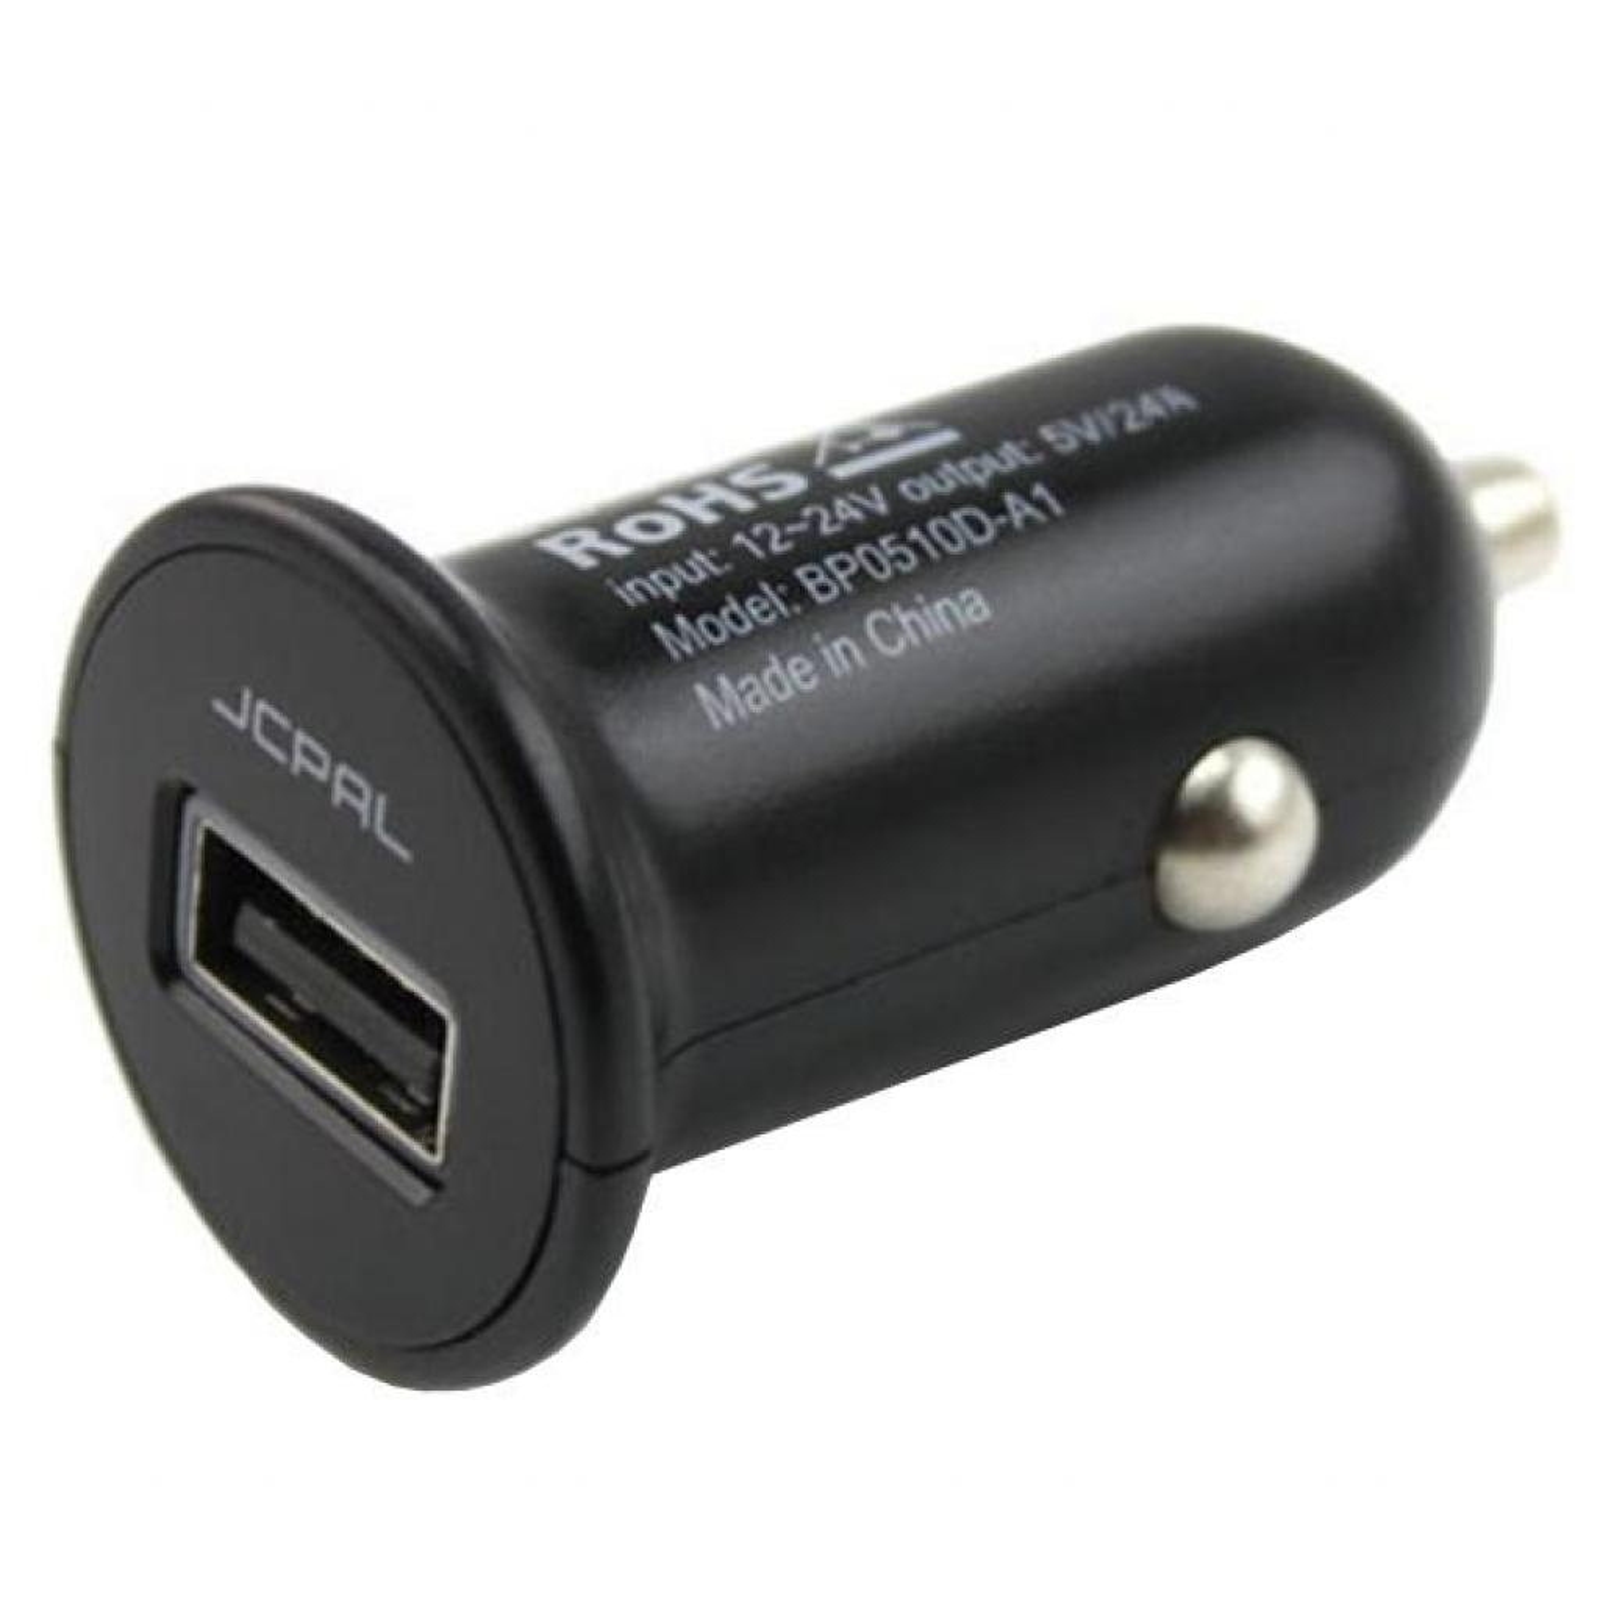 Зарядное устройство JCPAL Star 1*USB, 2.4A (JCP6005) изображение 2